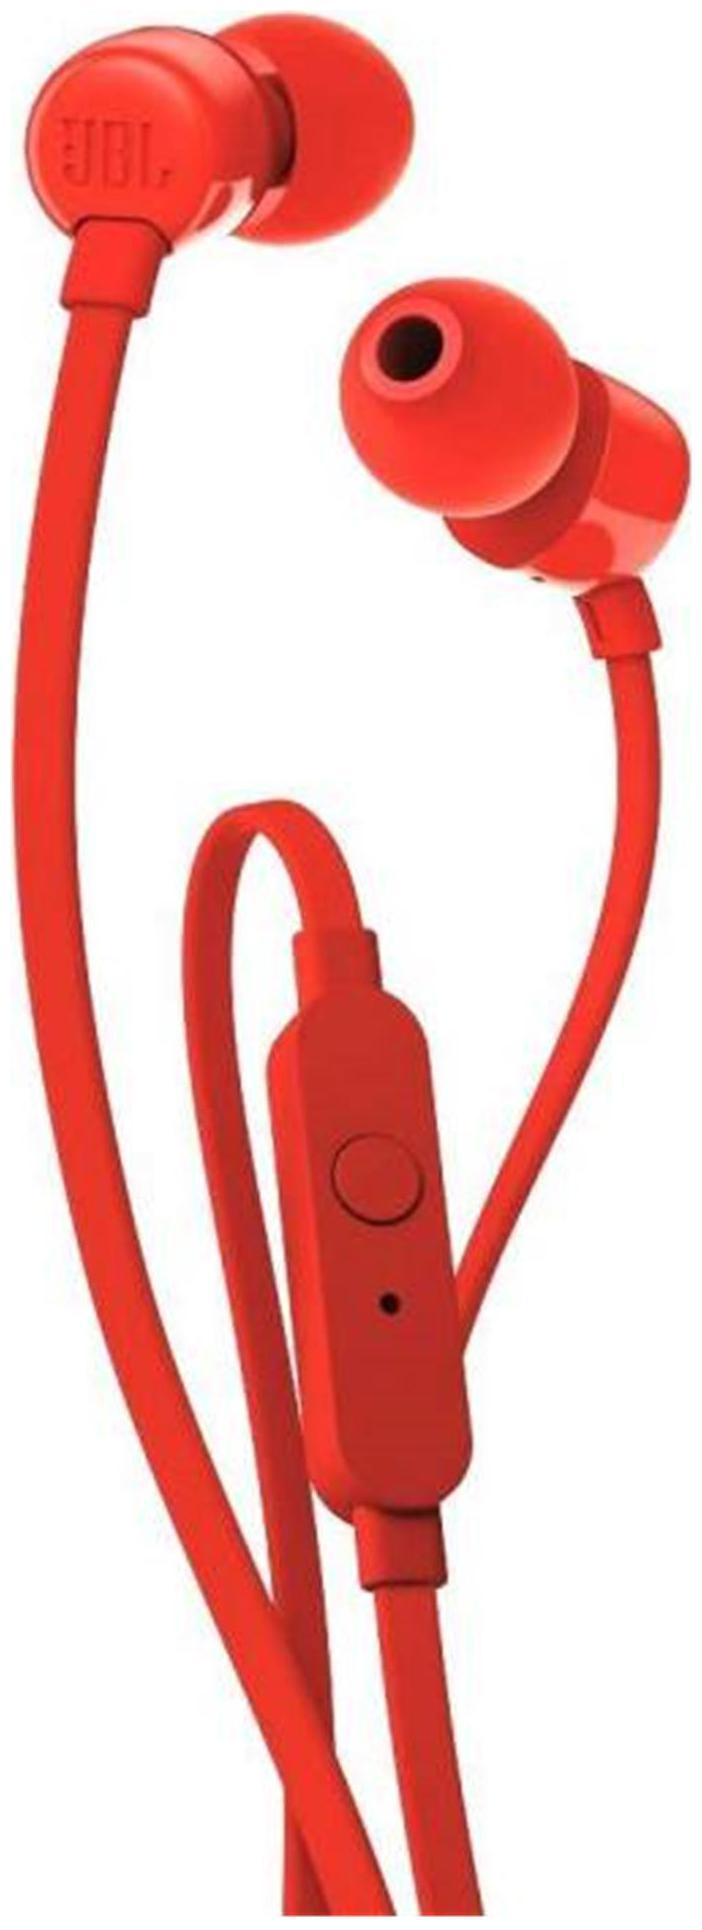 JBL T110 In Ear Headphones  Red